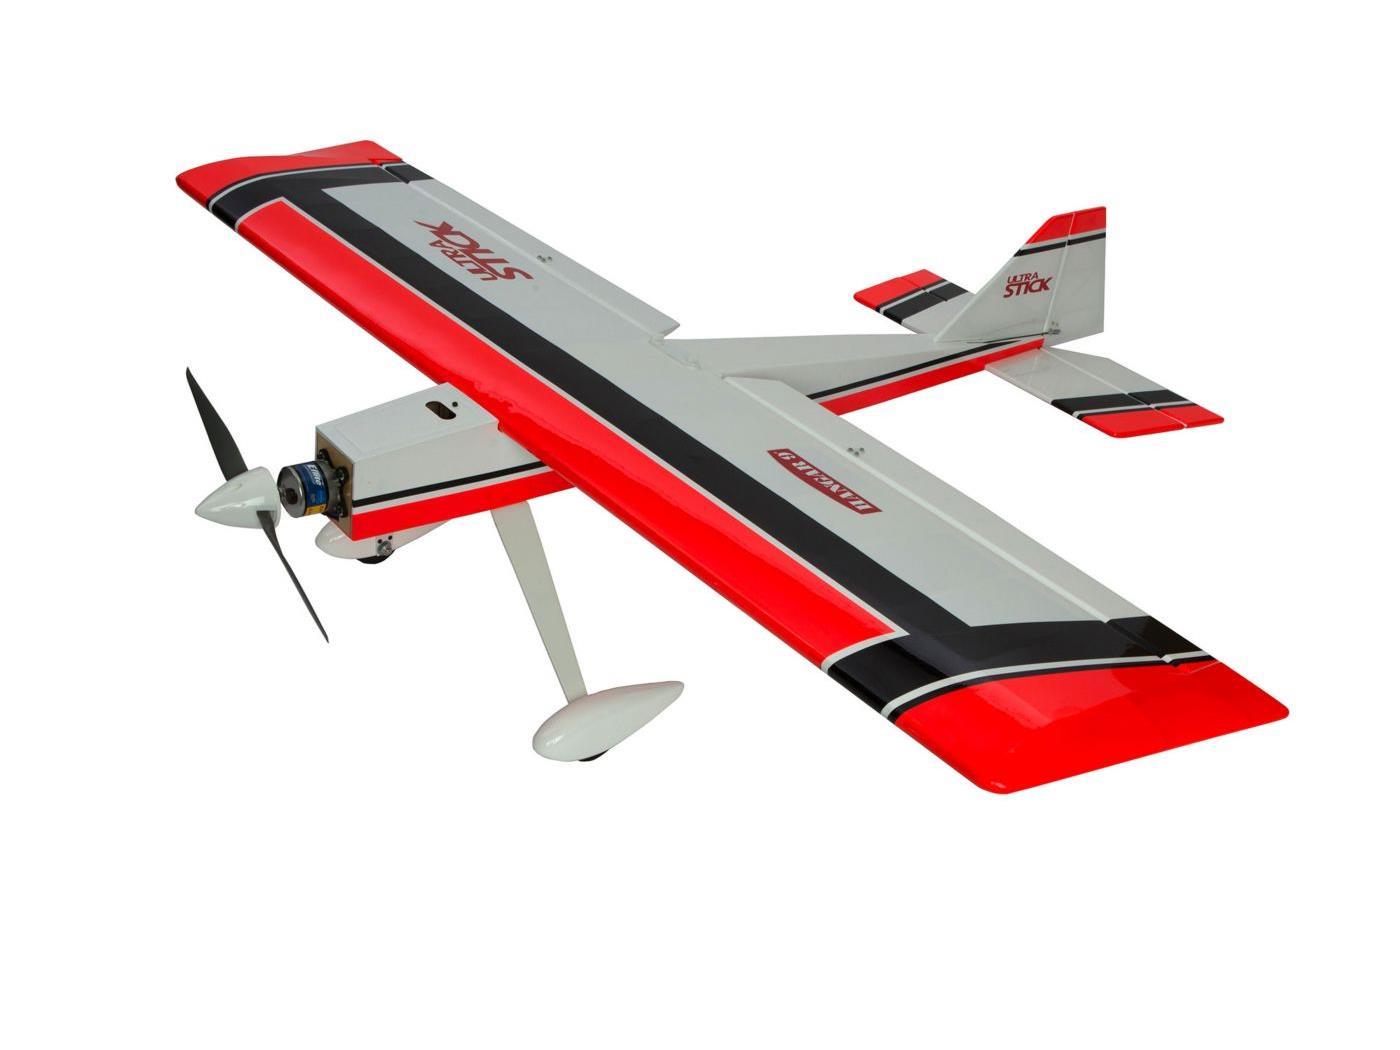 Hangar 9 Ultra Stick 10cc ARTF